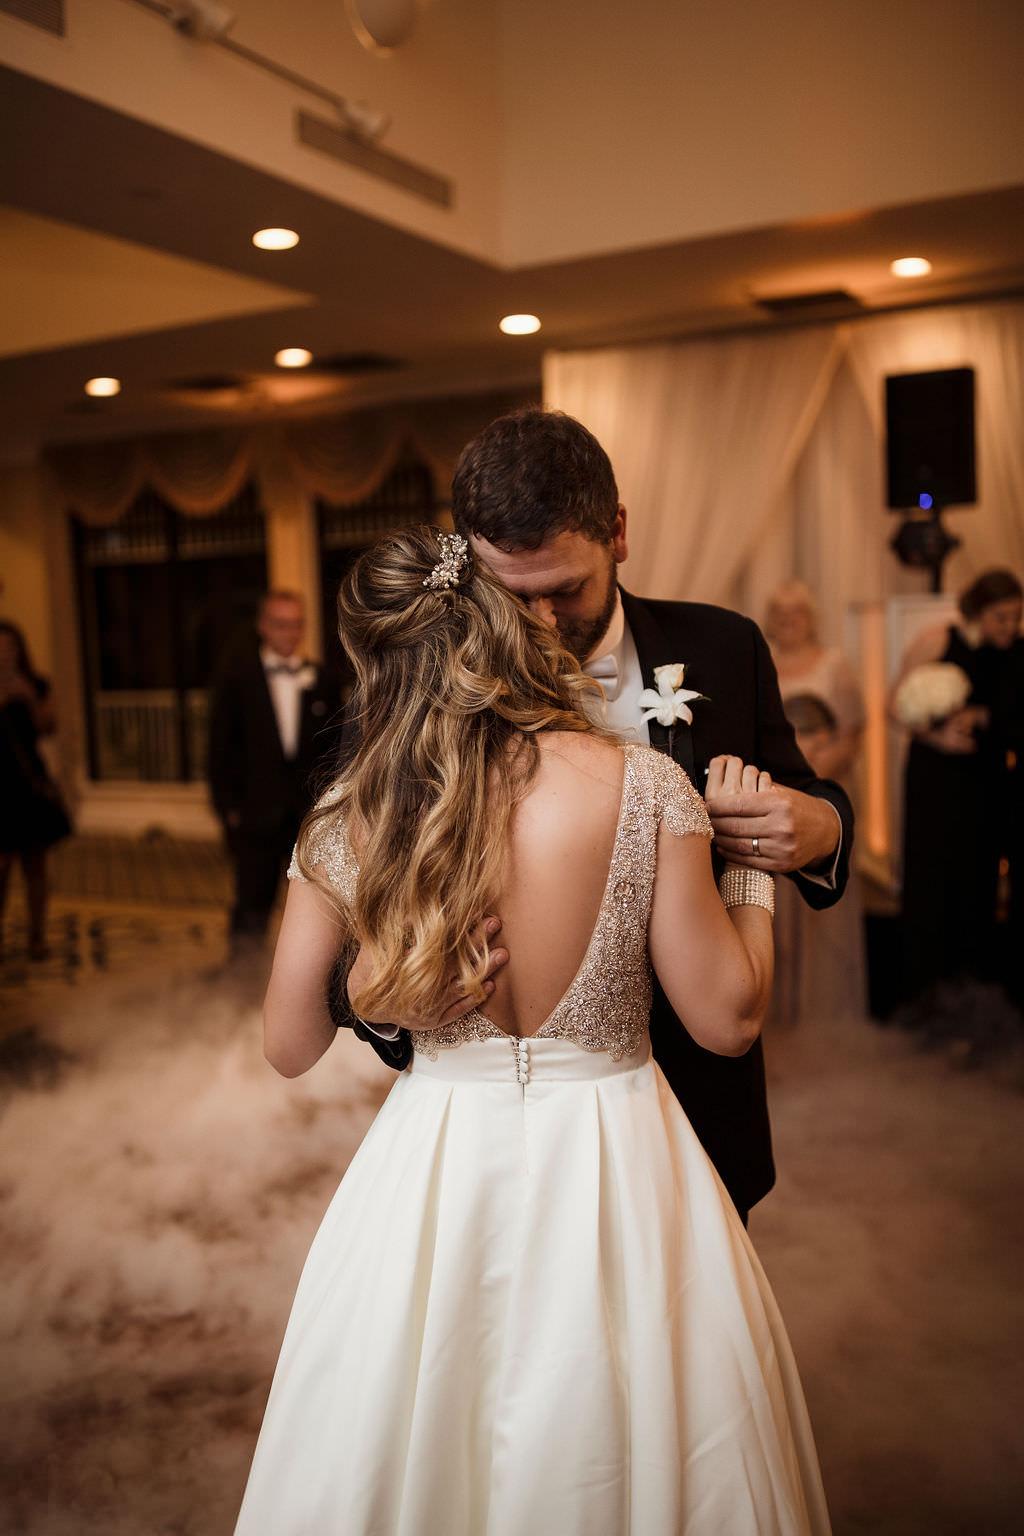 Florida Bride and Groom Classic Wedding Reception First Dance Wedding Portrait